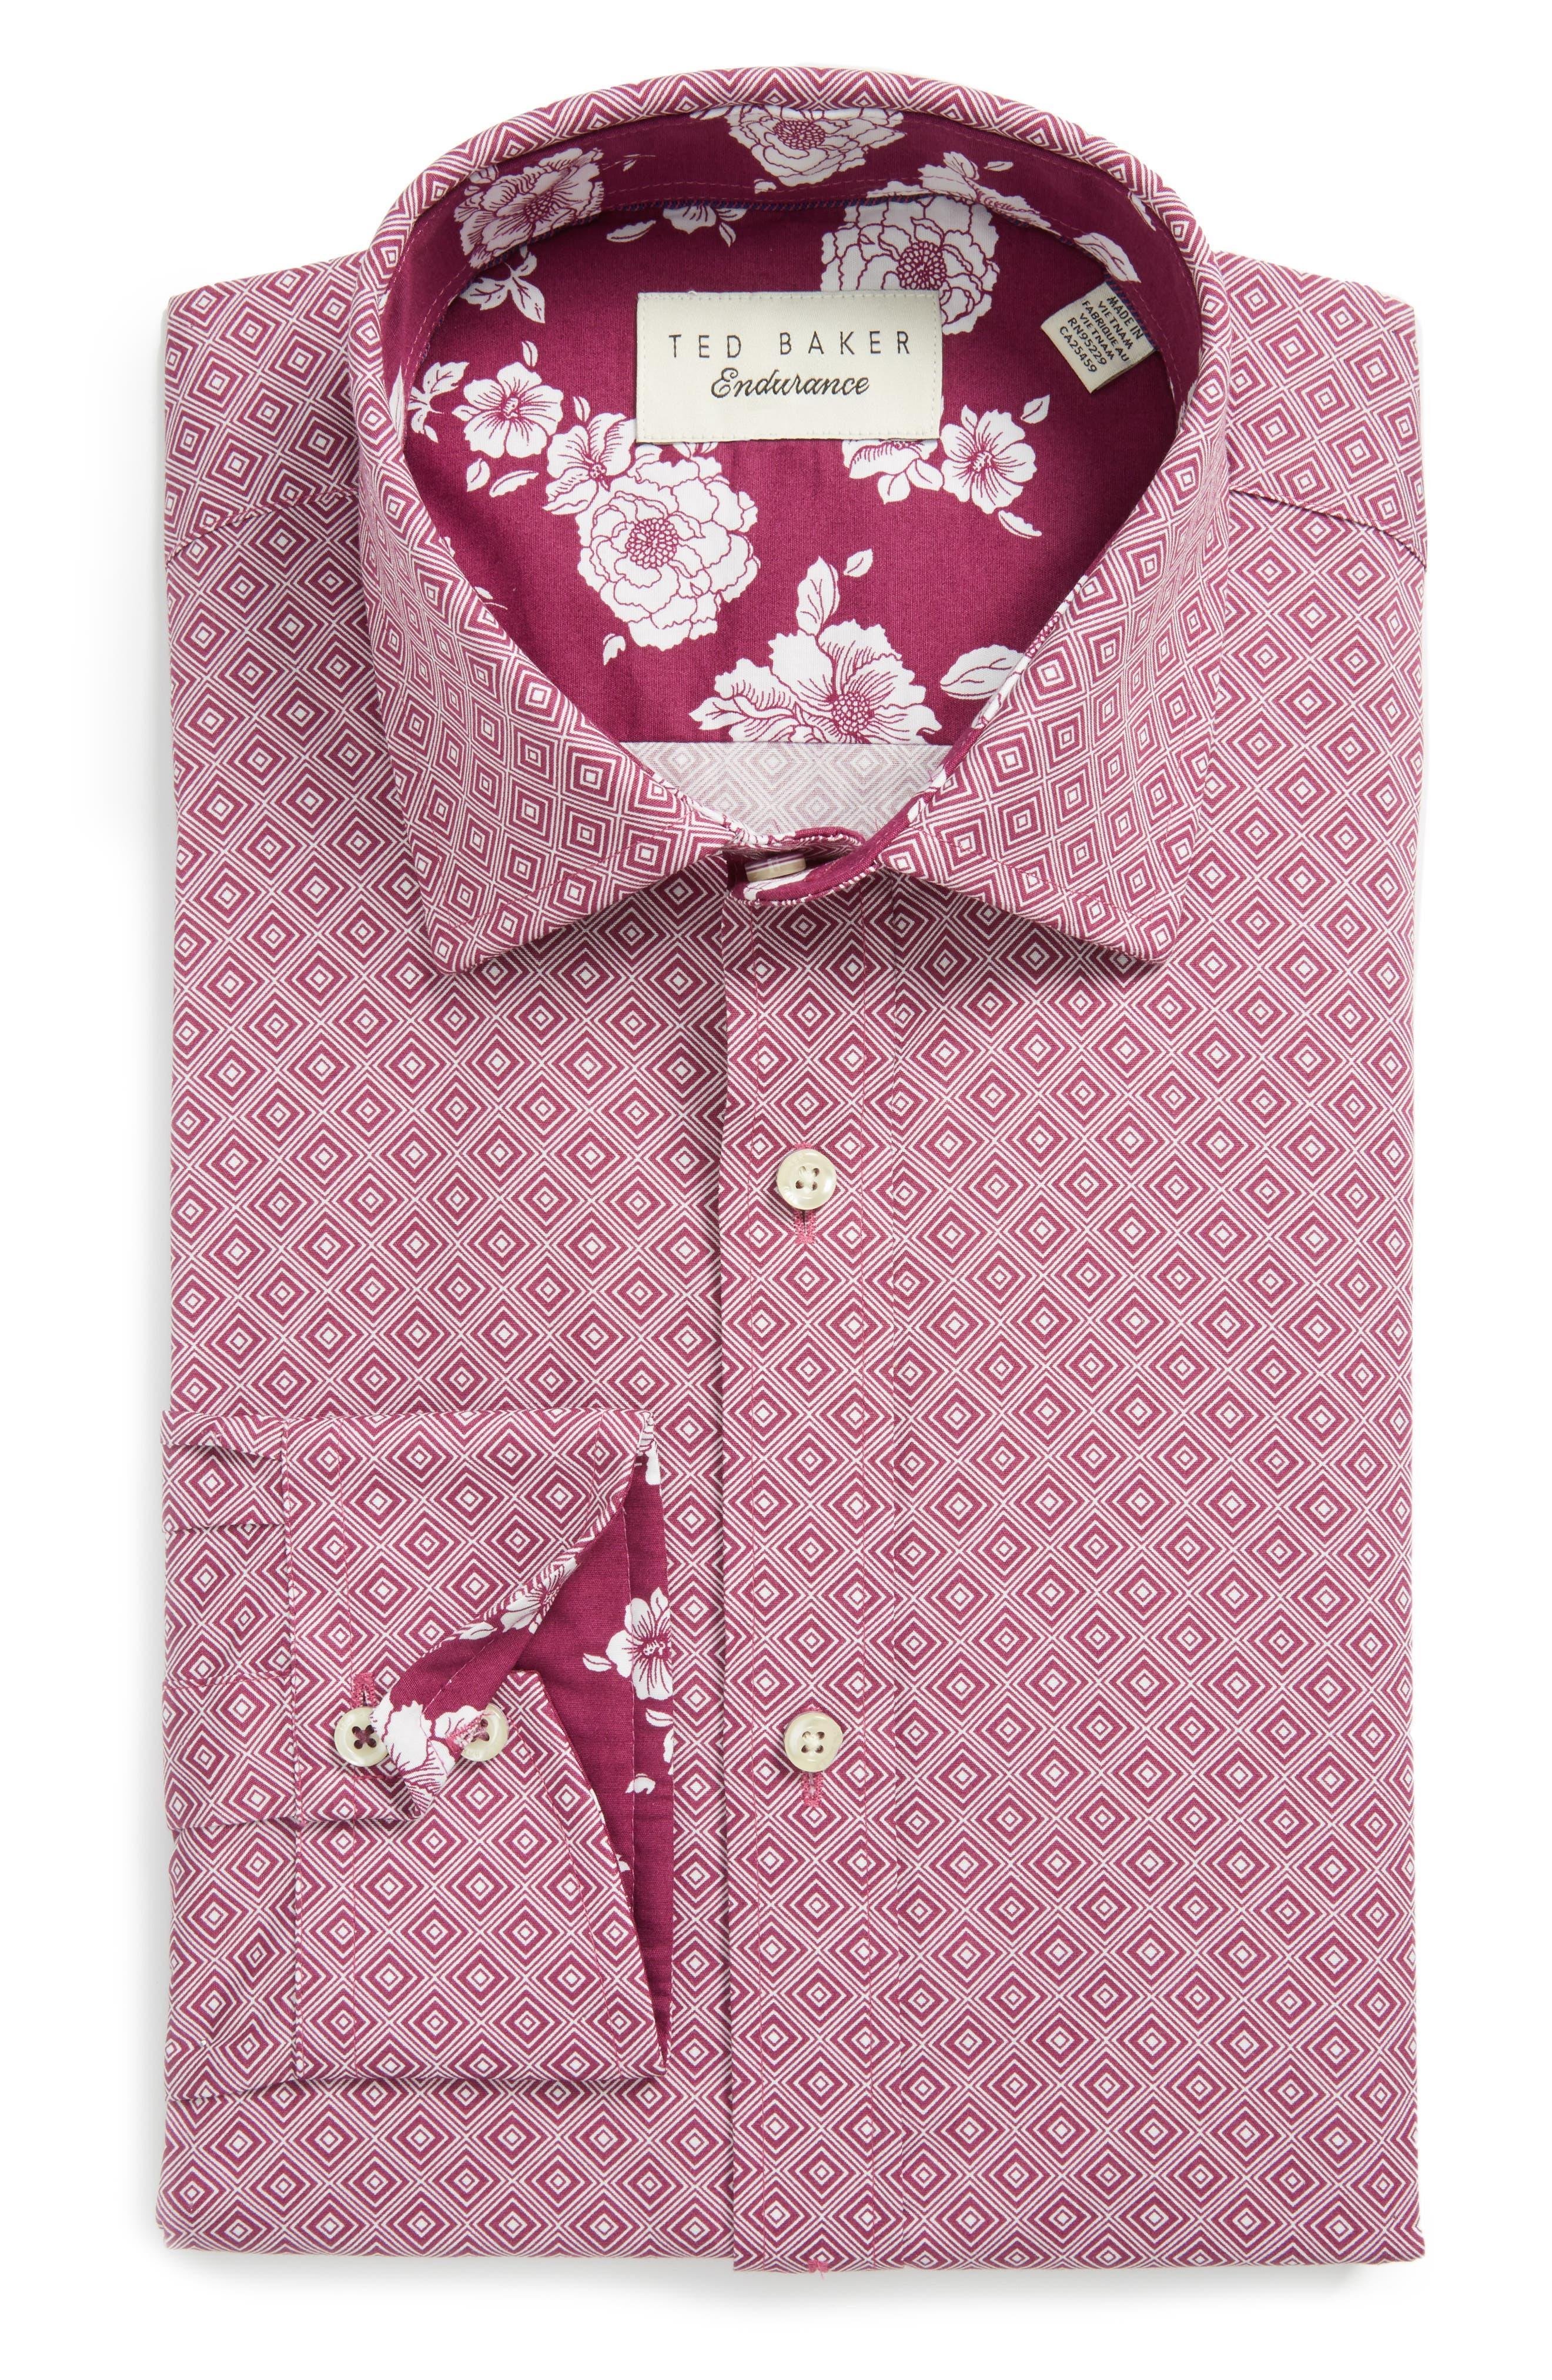 Endurance Trim Fit Dress Shirt,                         Main,                         color, Pink